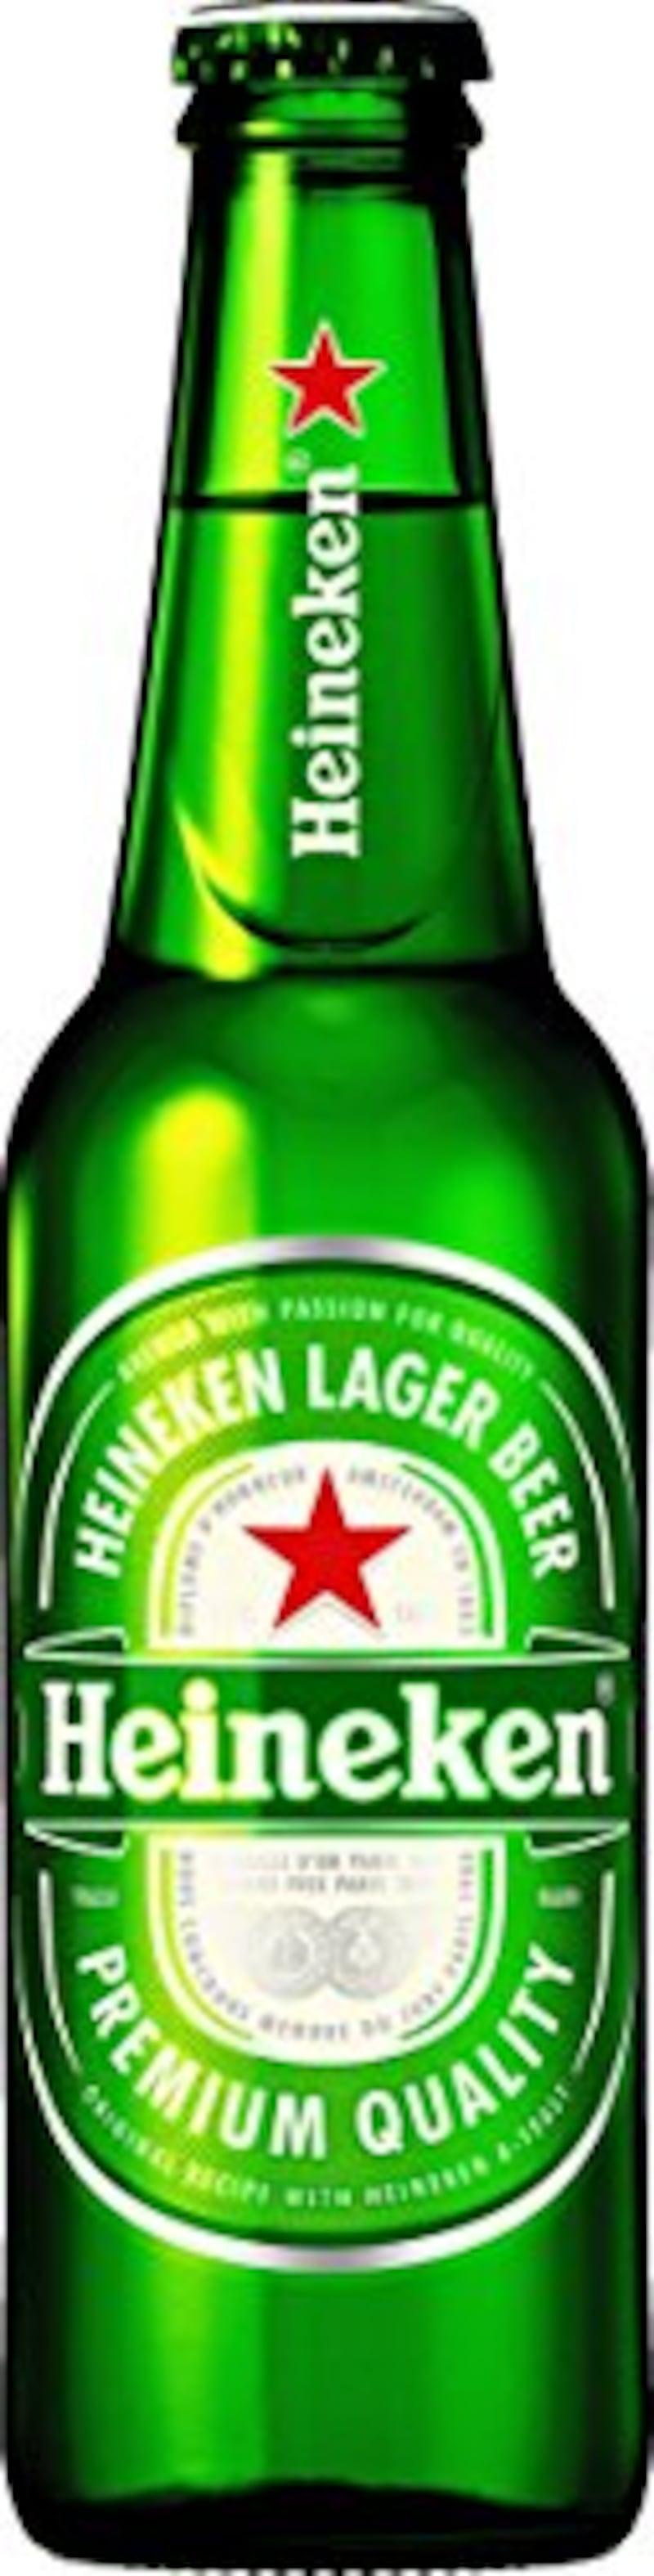 Carlsberg(カールスバーグ),ハイネケン ロングネック 瓶 330ml